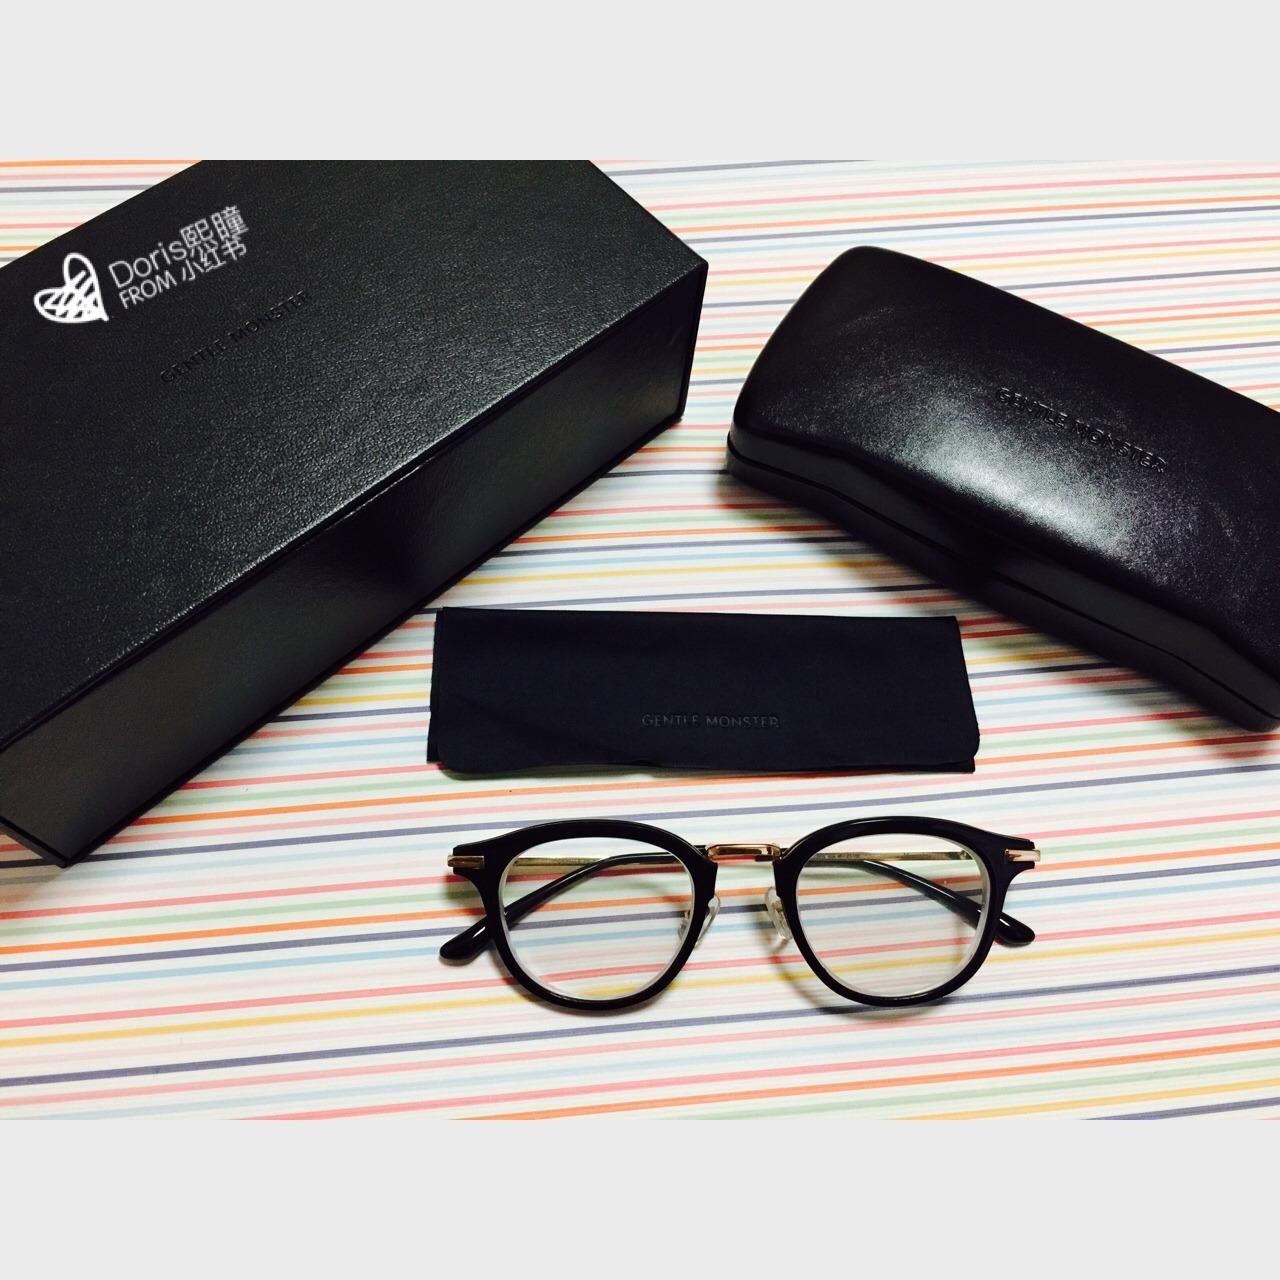 Gentle Monster眼镜_价格_怎么样__韩国买什么-小红书